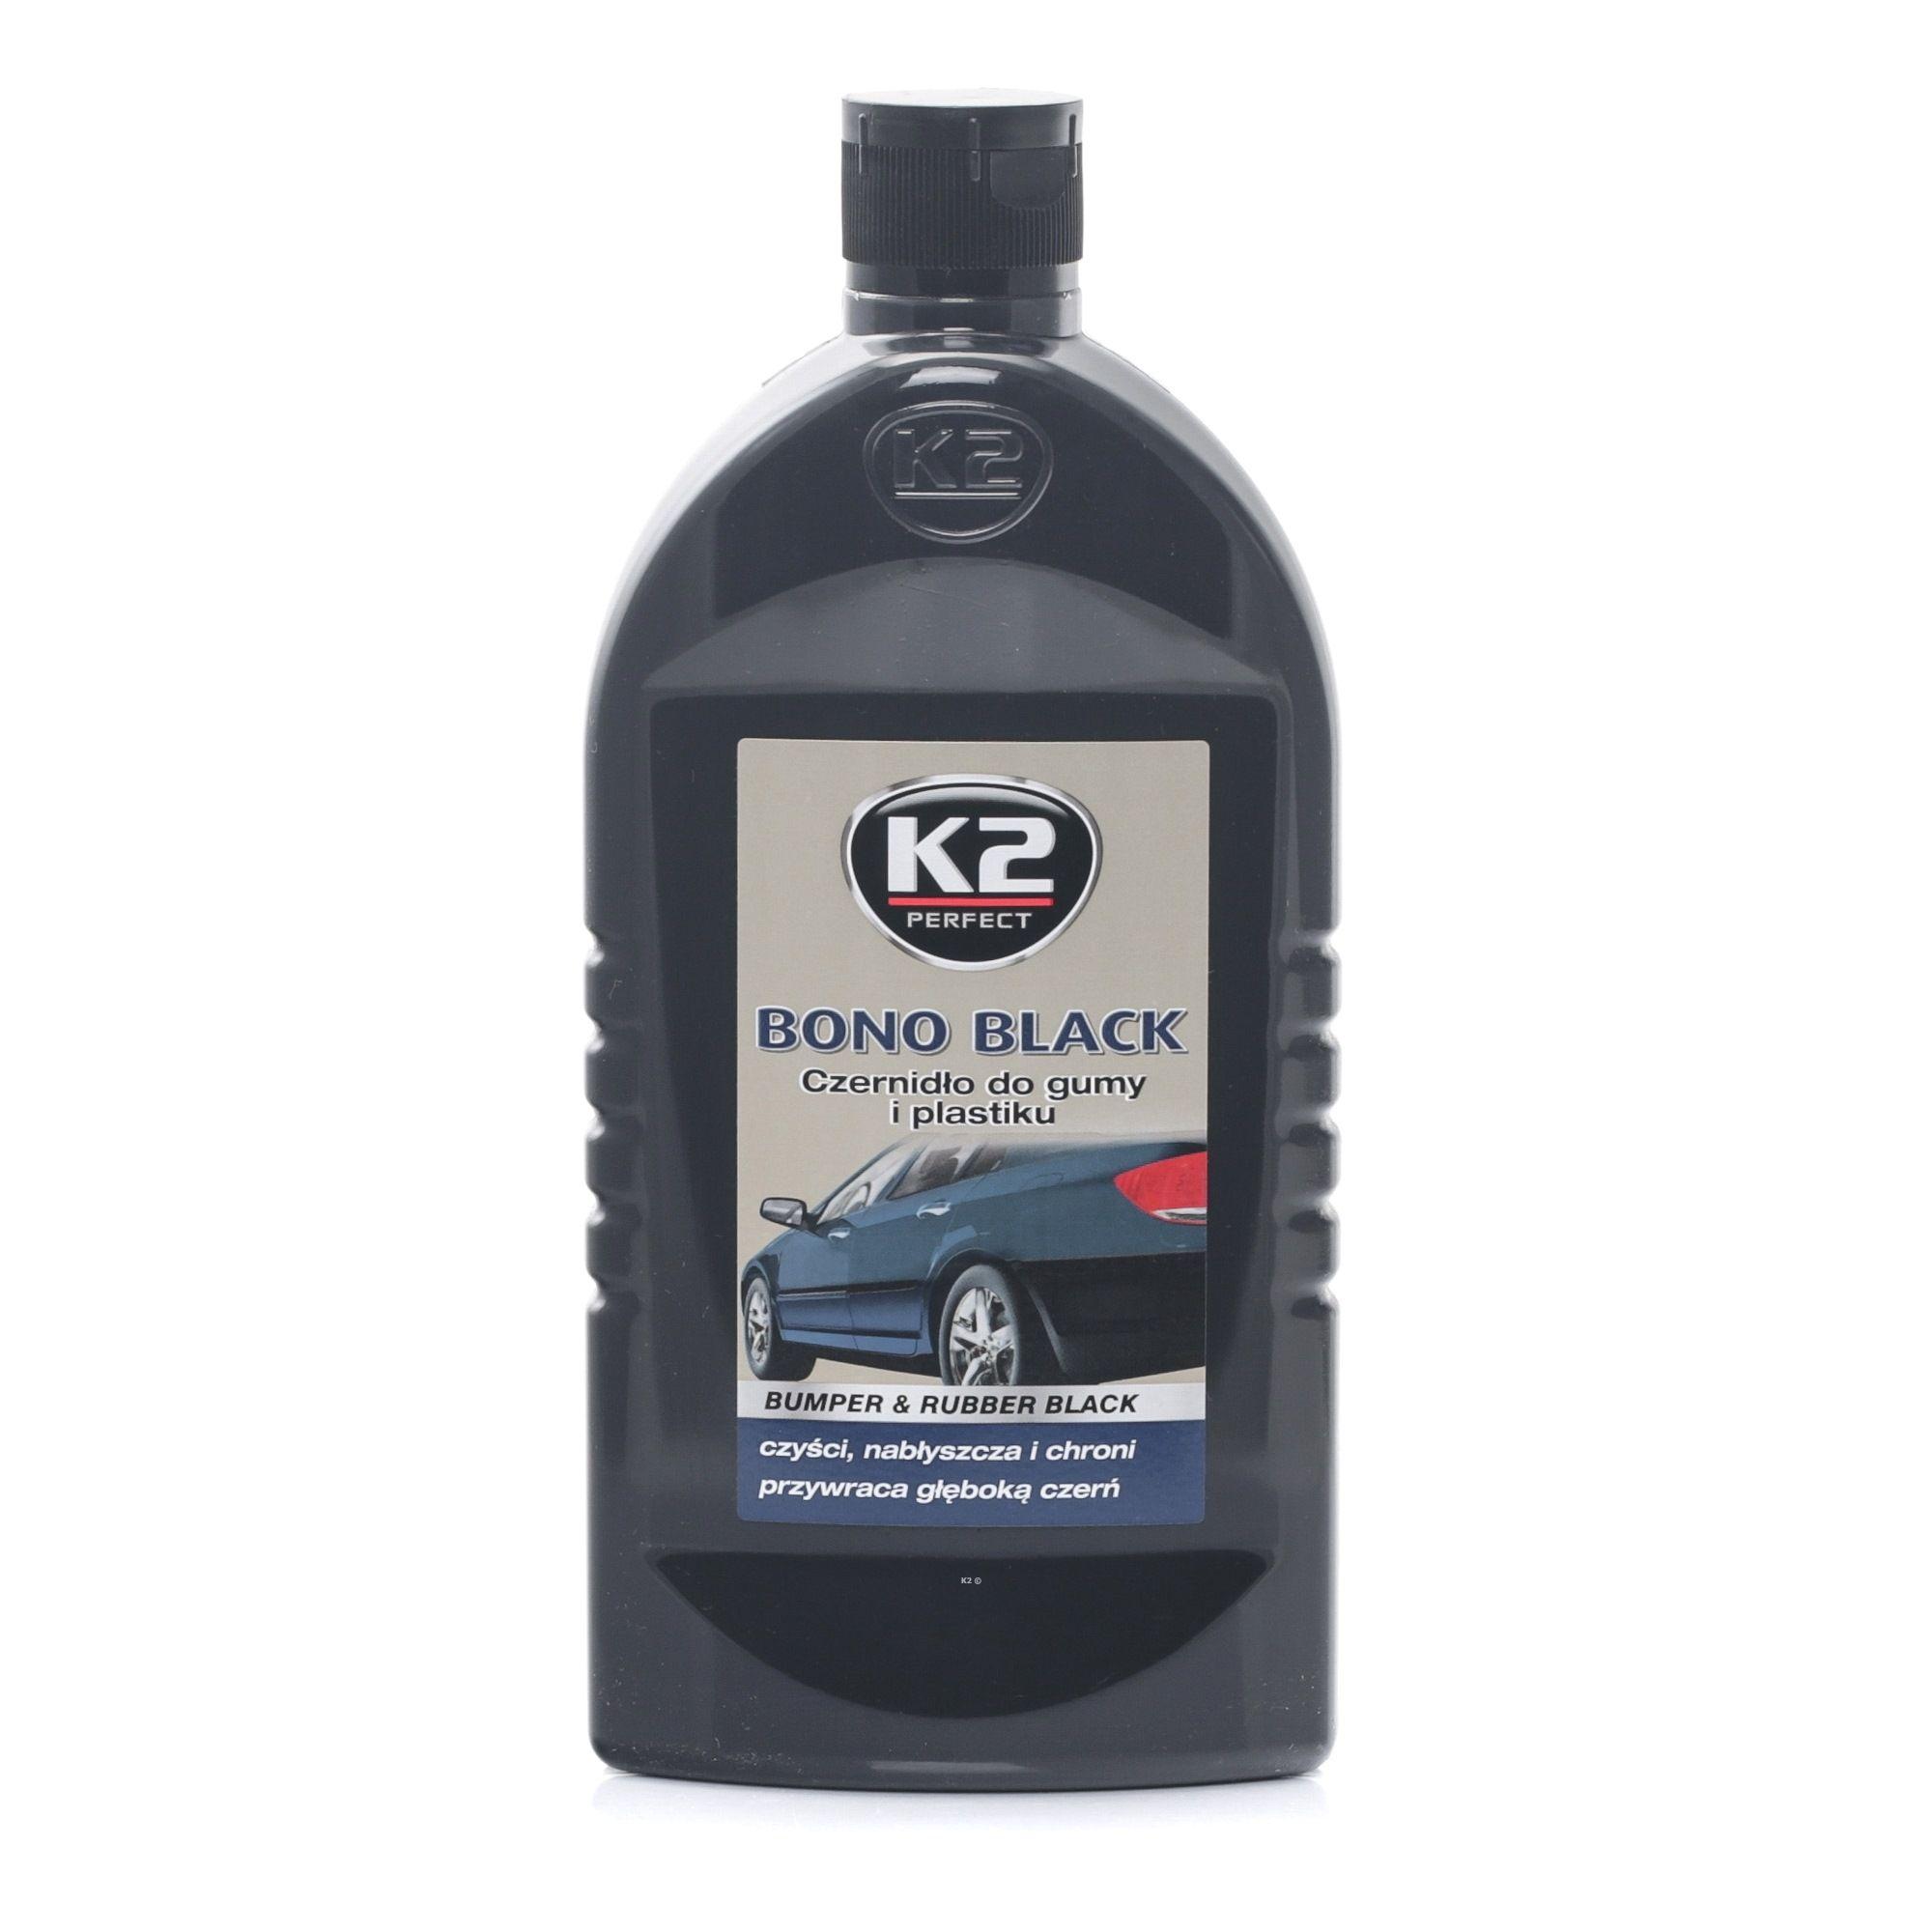 Gummipflegemittel K2 K035 Bewertung